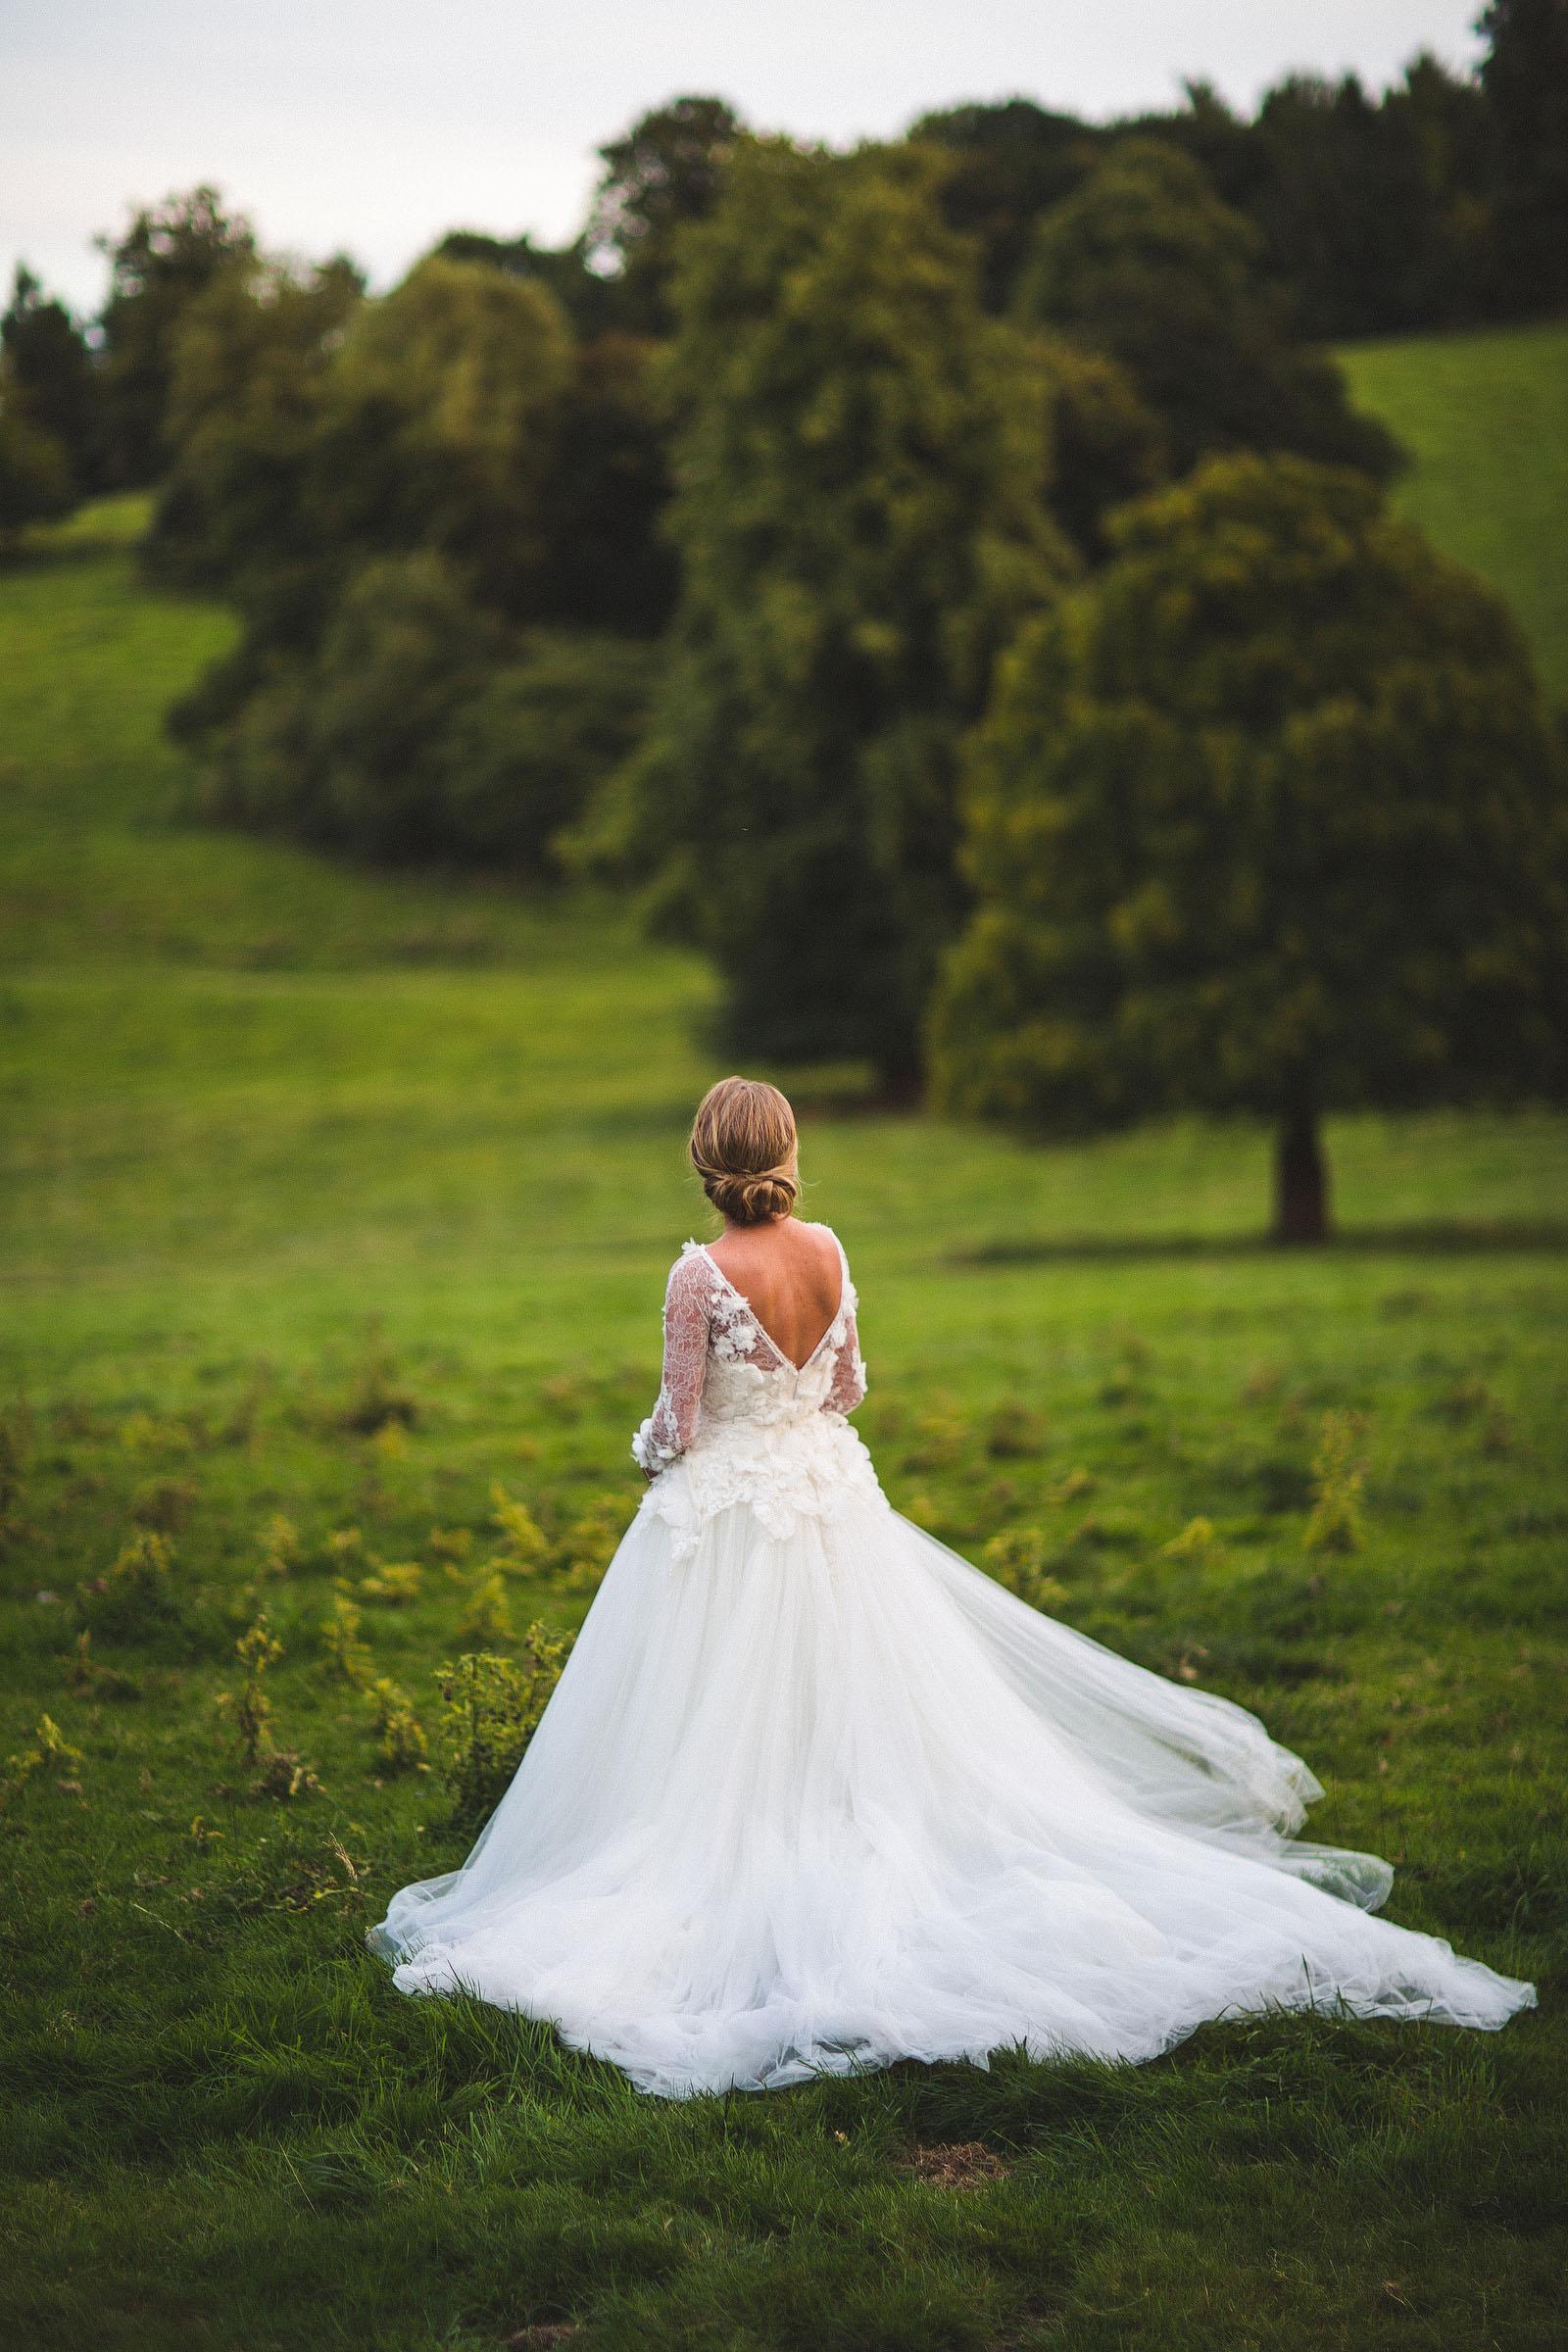 weddings at Hassop1